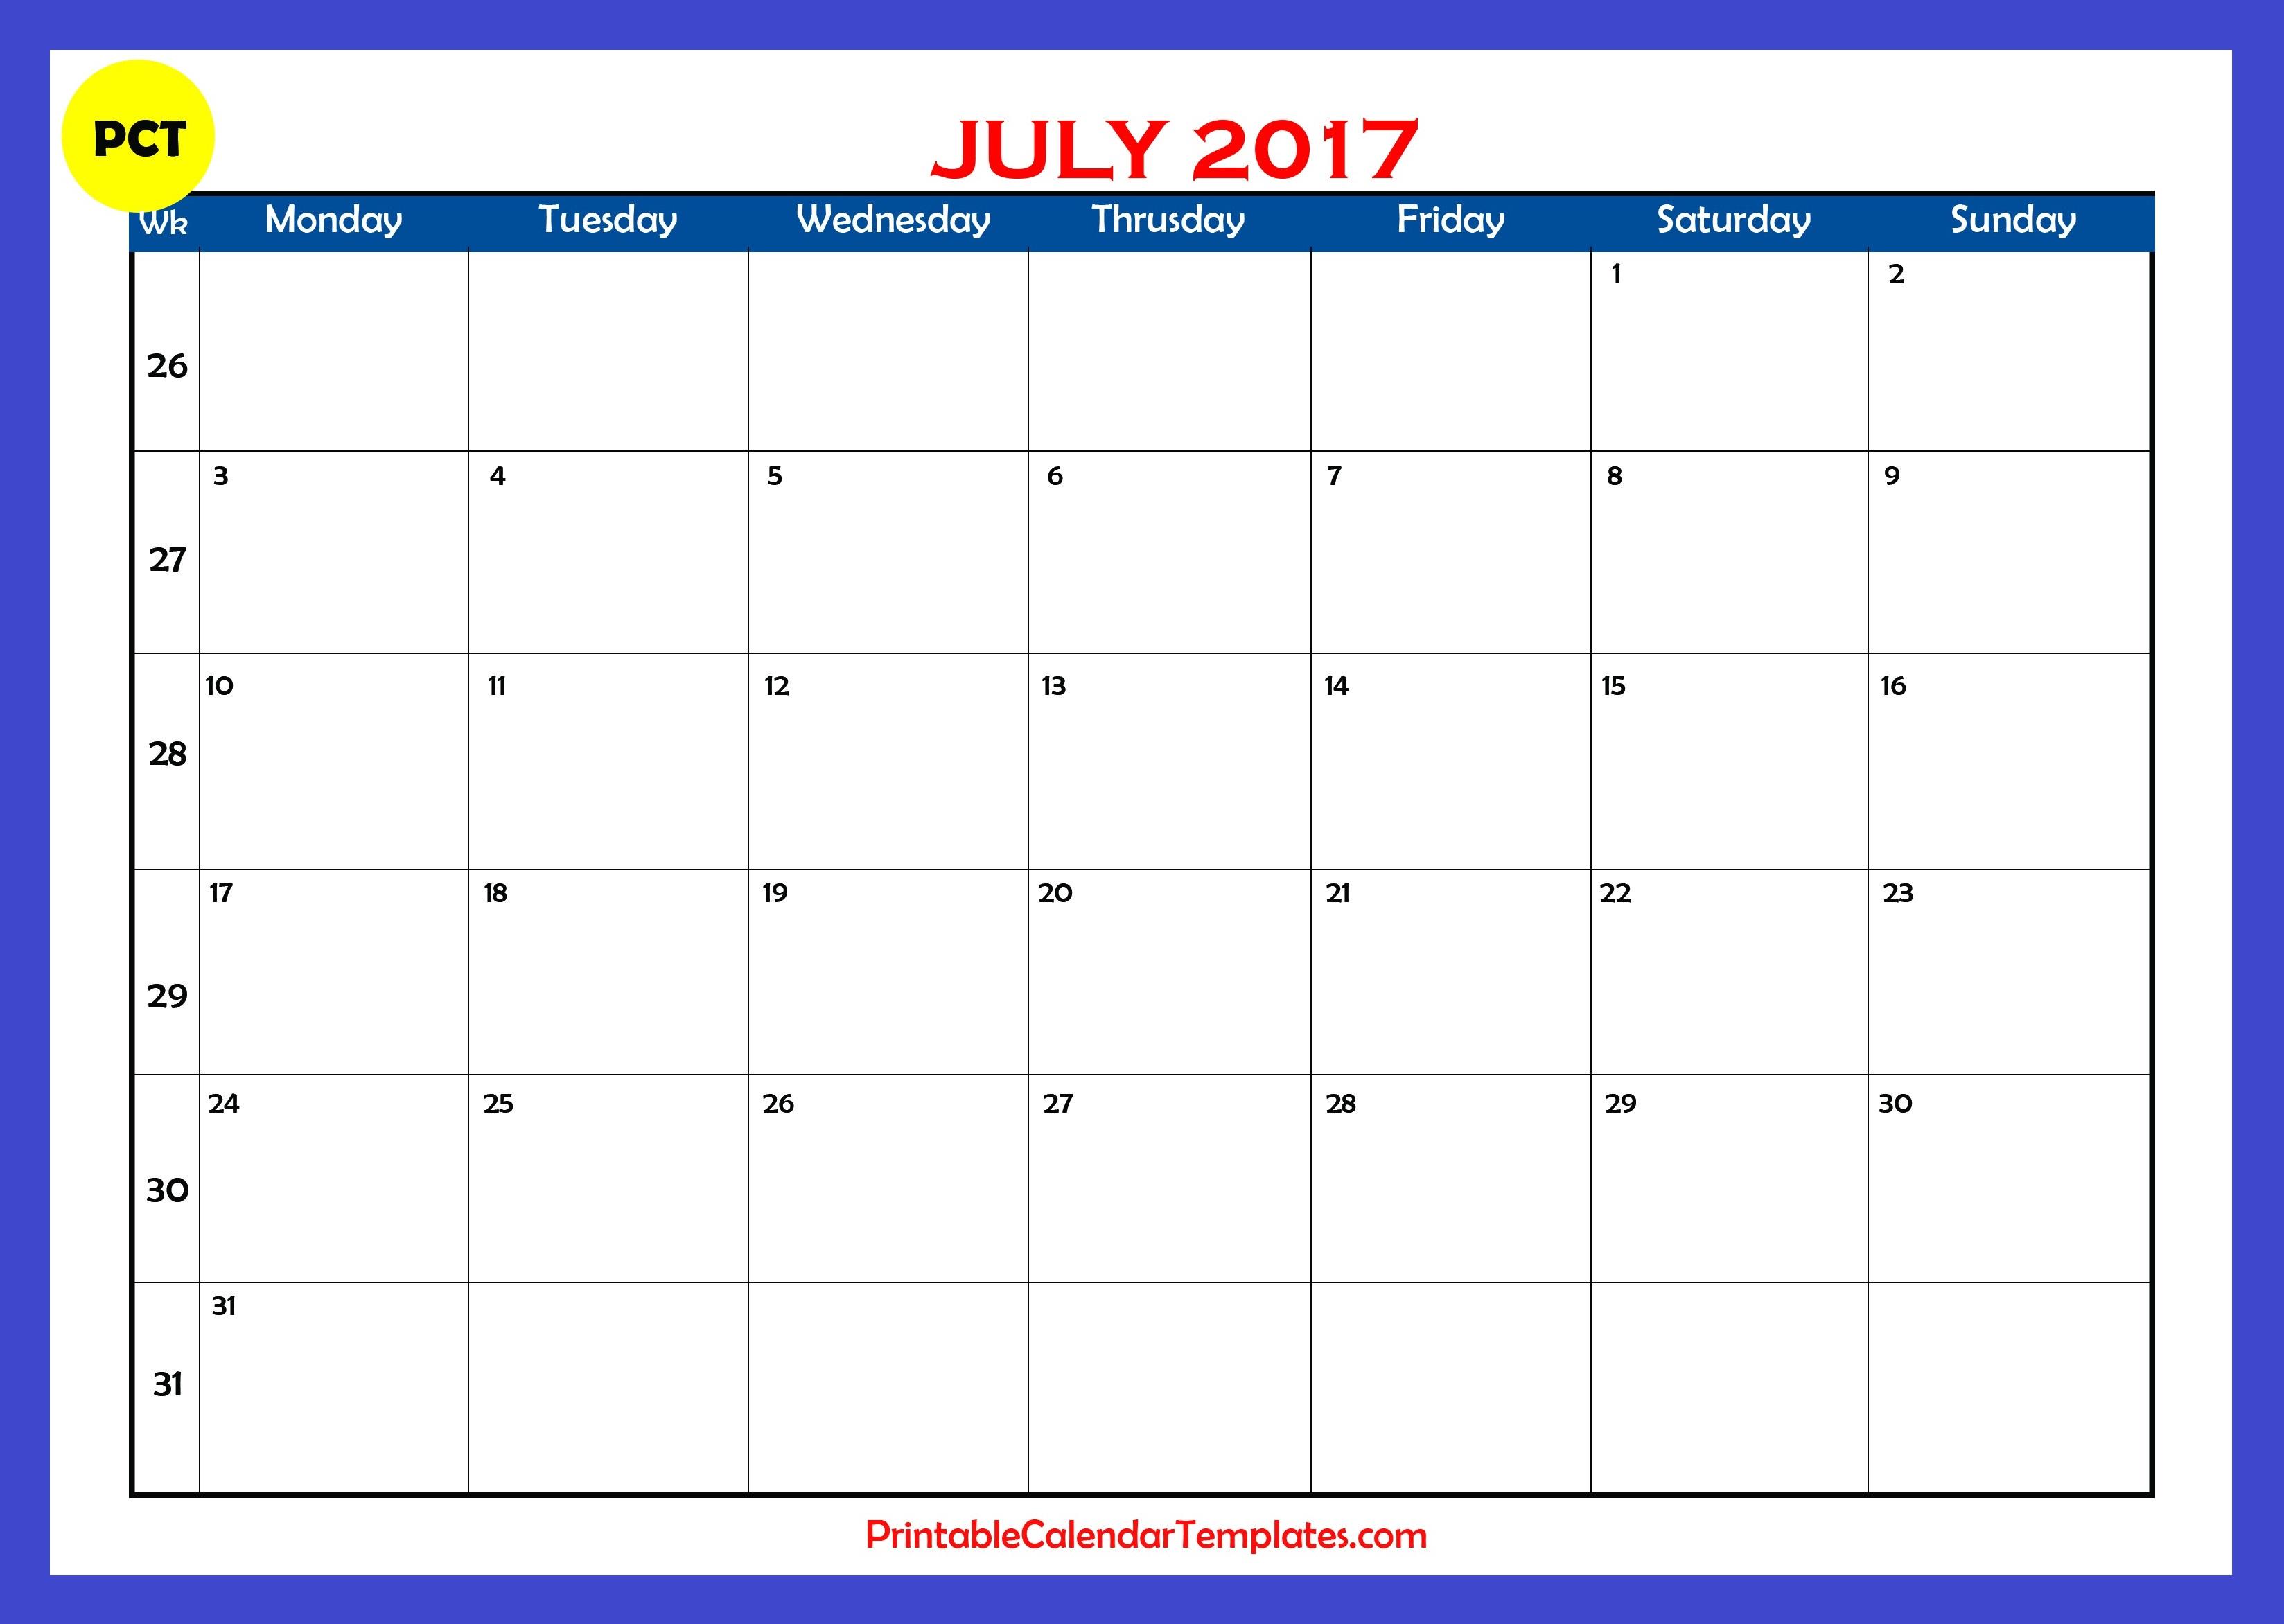 Calendar June To December : July calendar printable templates